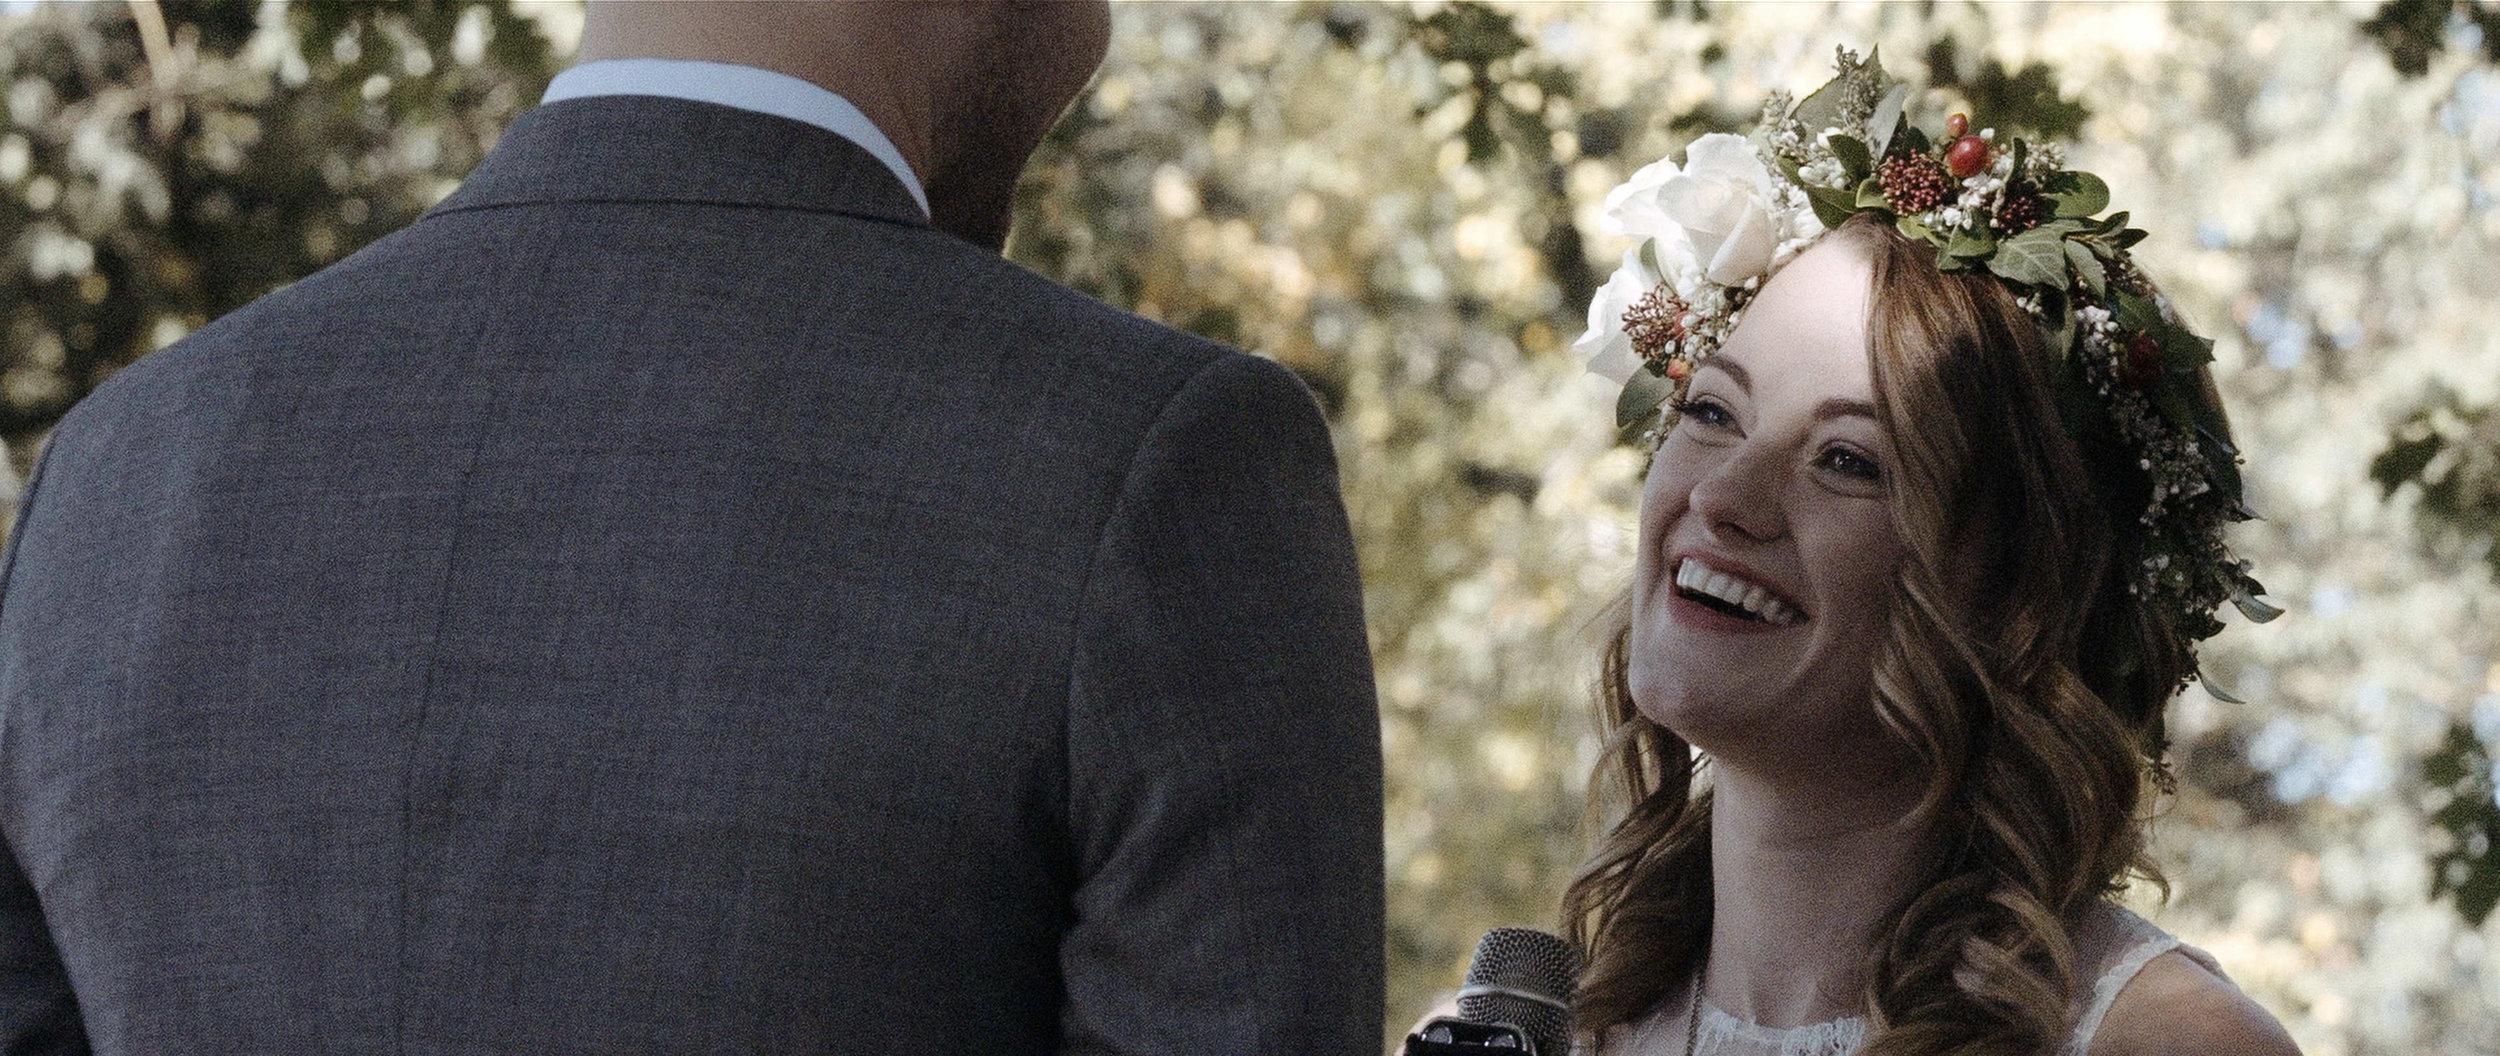 vancouver-wedding-videography169.jpg